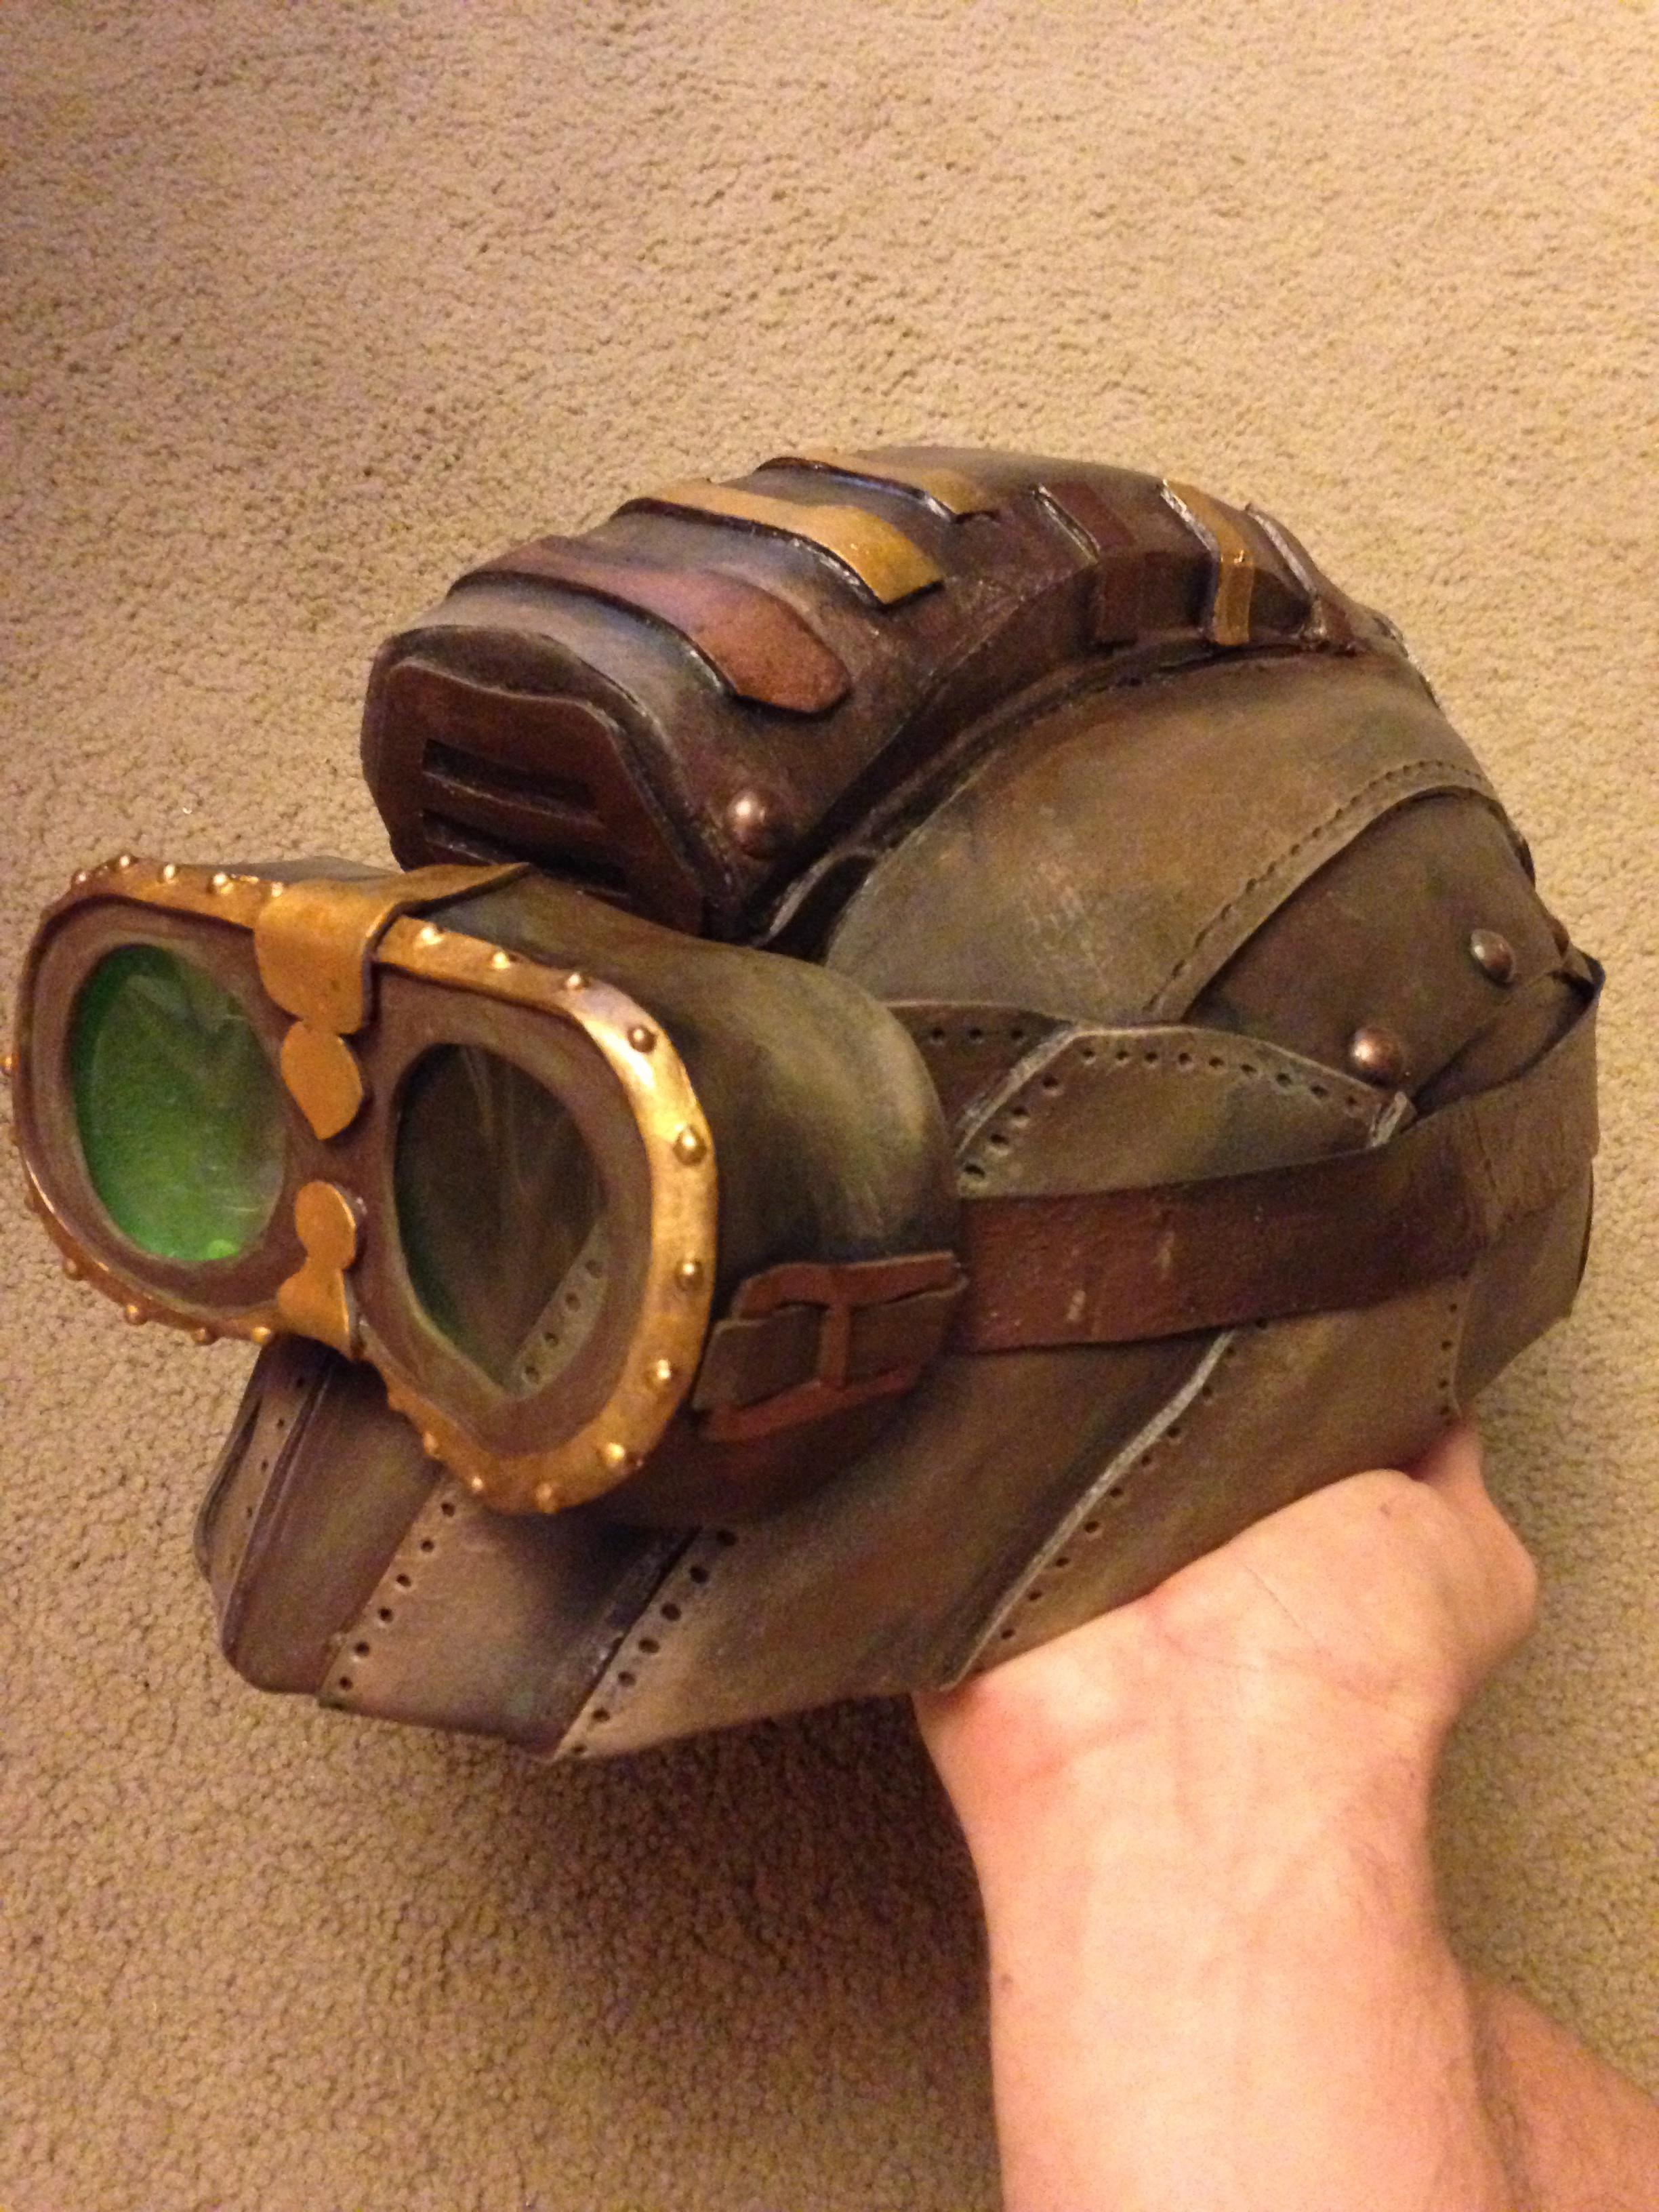 Picture of Steam Punk Bike Helmet